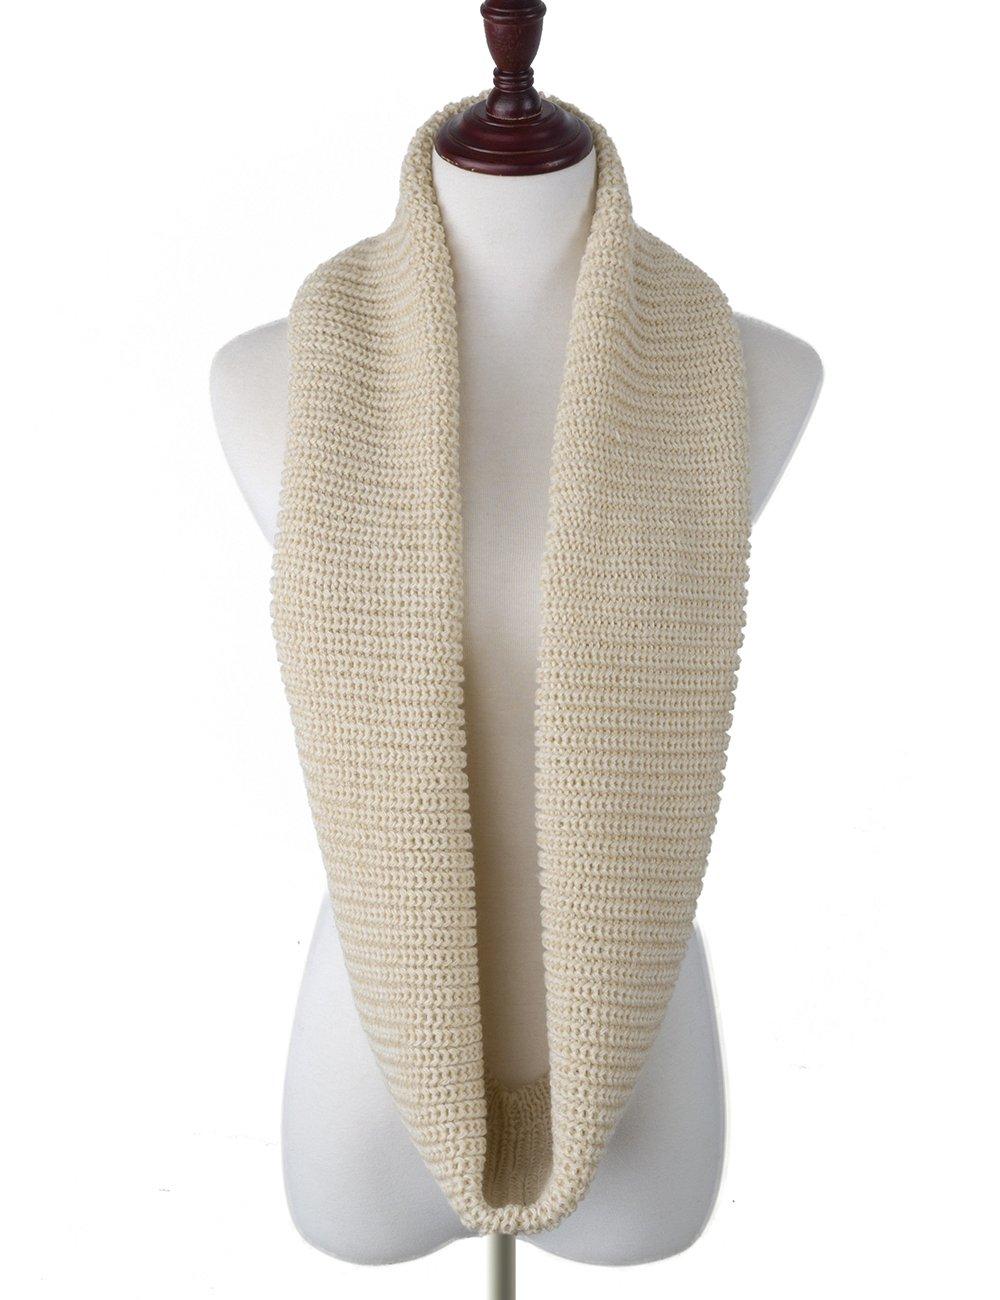 EVRFELAN Infinity Scarf Winter Warm Women Knit Circle Loop Scarves Accessories Grey Soft Neck Men Fashion Ribbed Cowl (Beige)